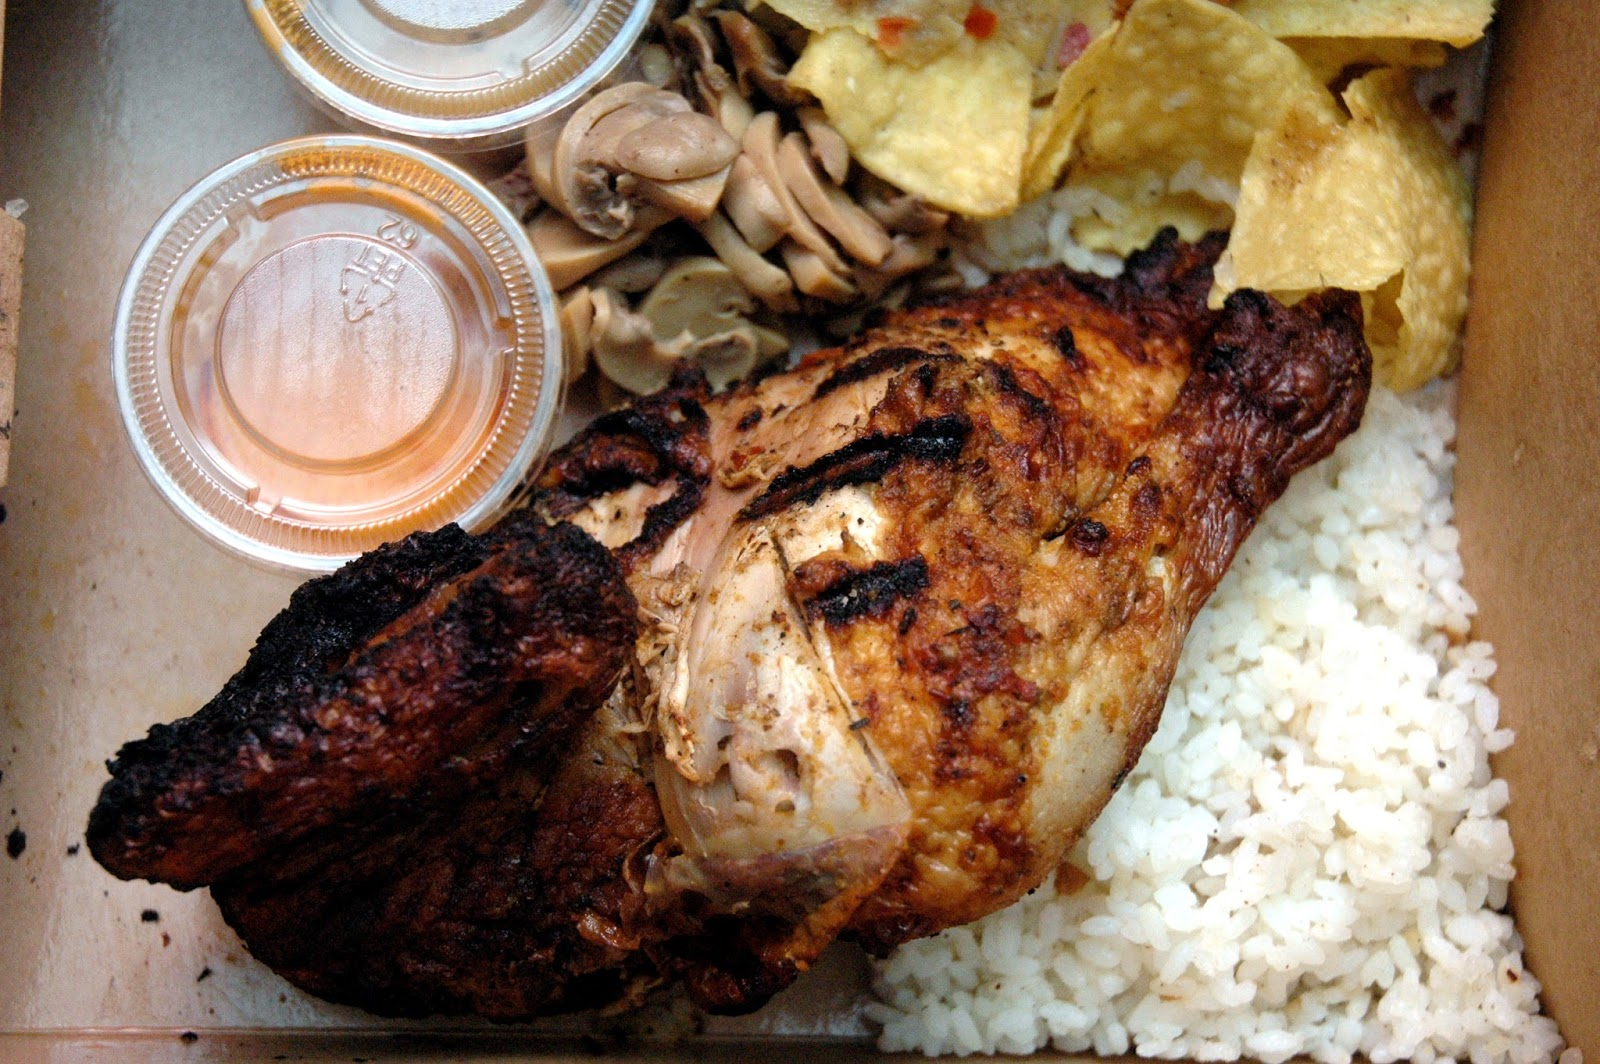 Gringo S Mexican Kitchen Chicken Tortilla Soup Recipe